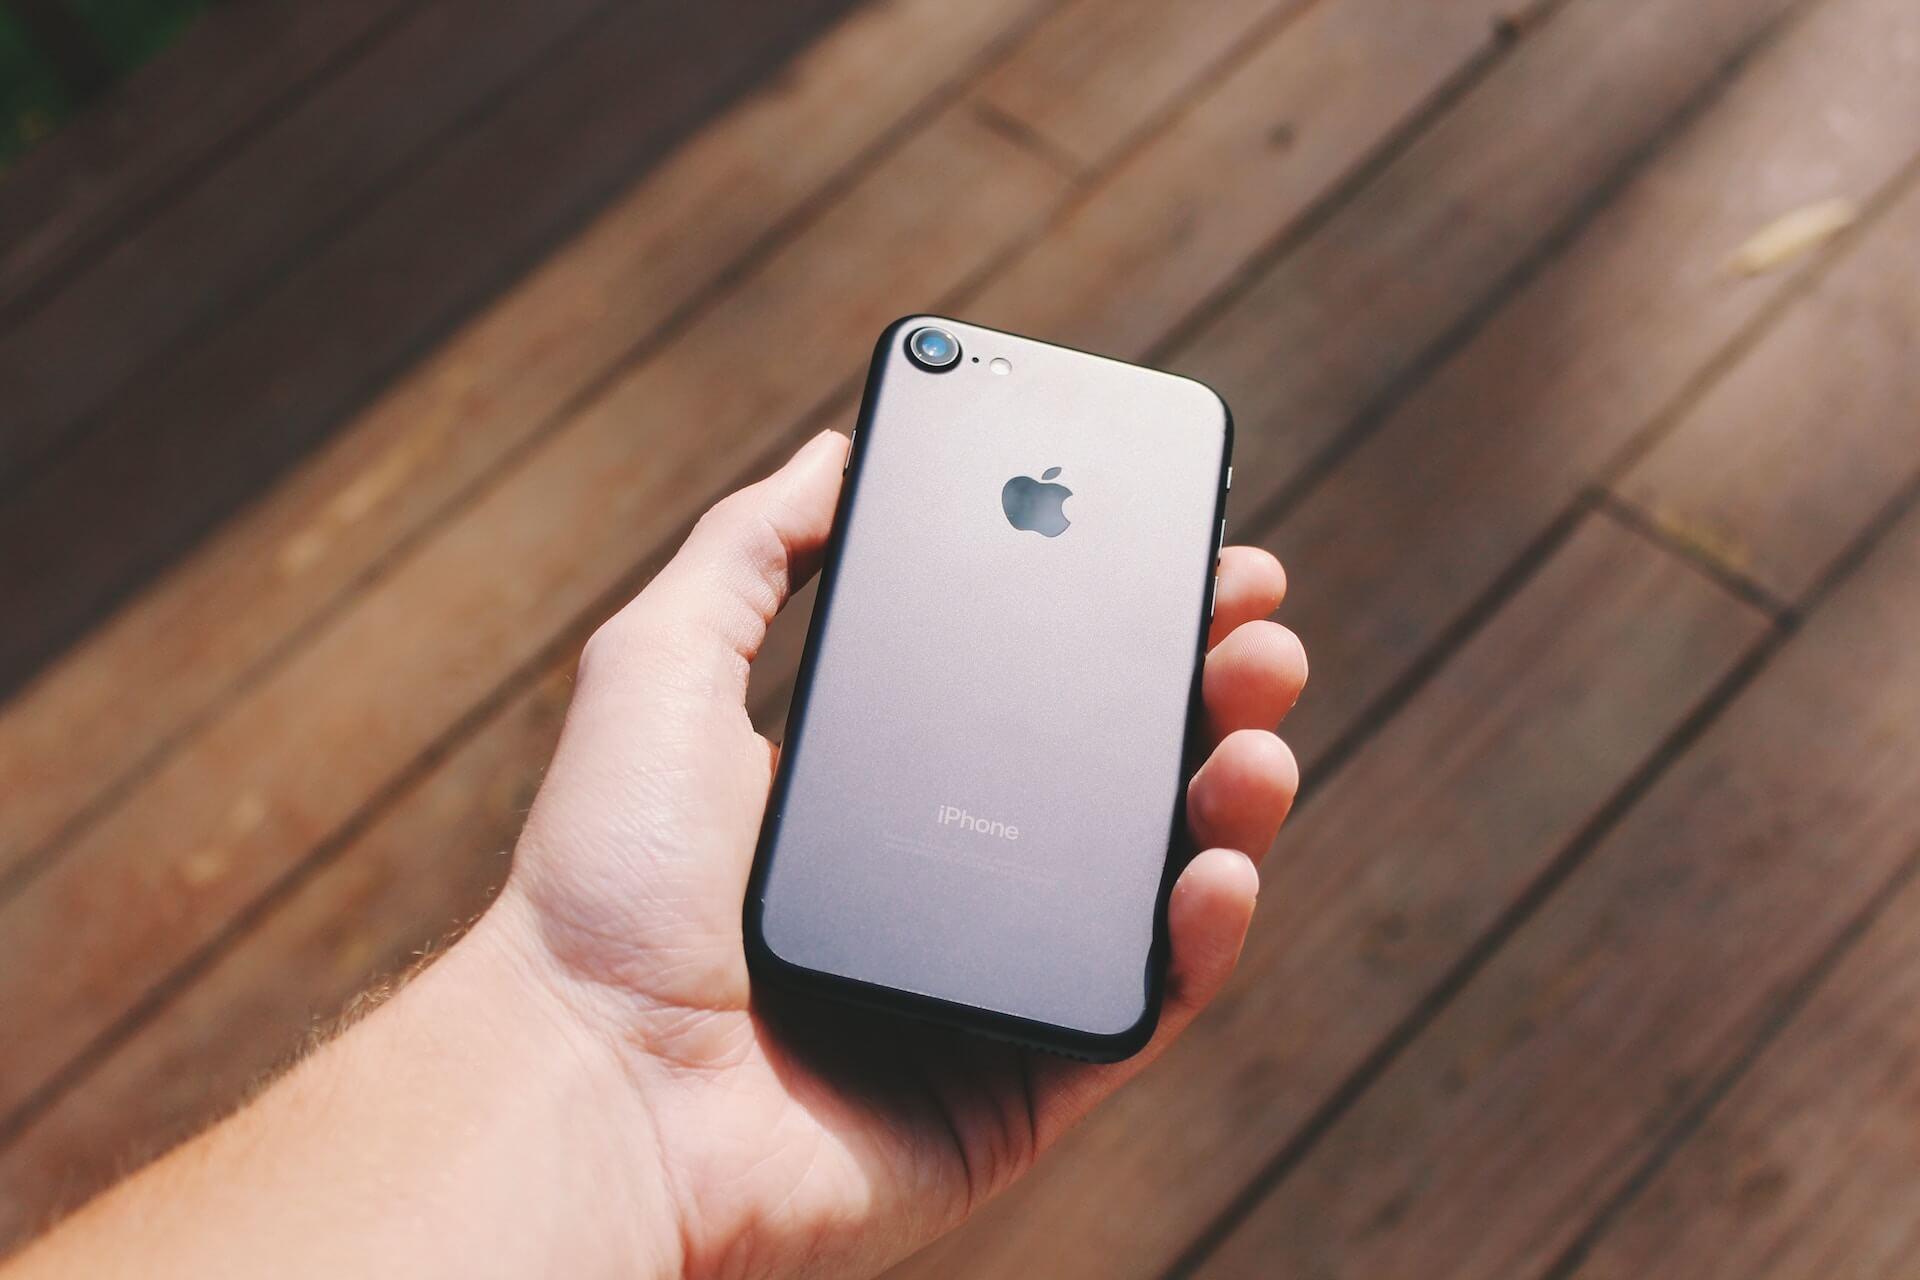 iPhone SE 2の生産がついに来月開始か?3月発表の見通し tech200121_iphonese2_main